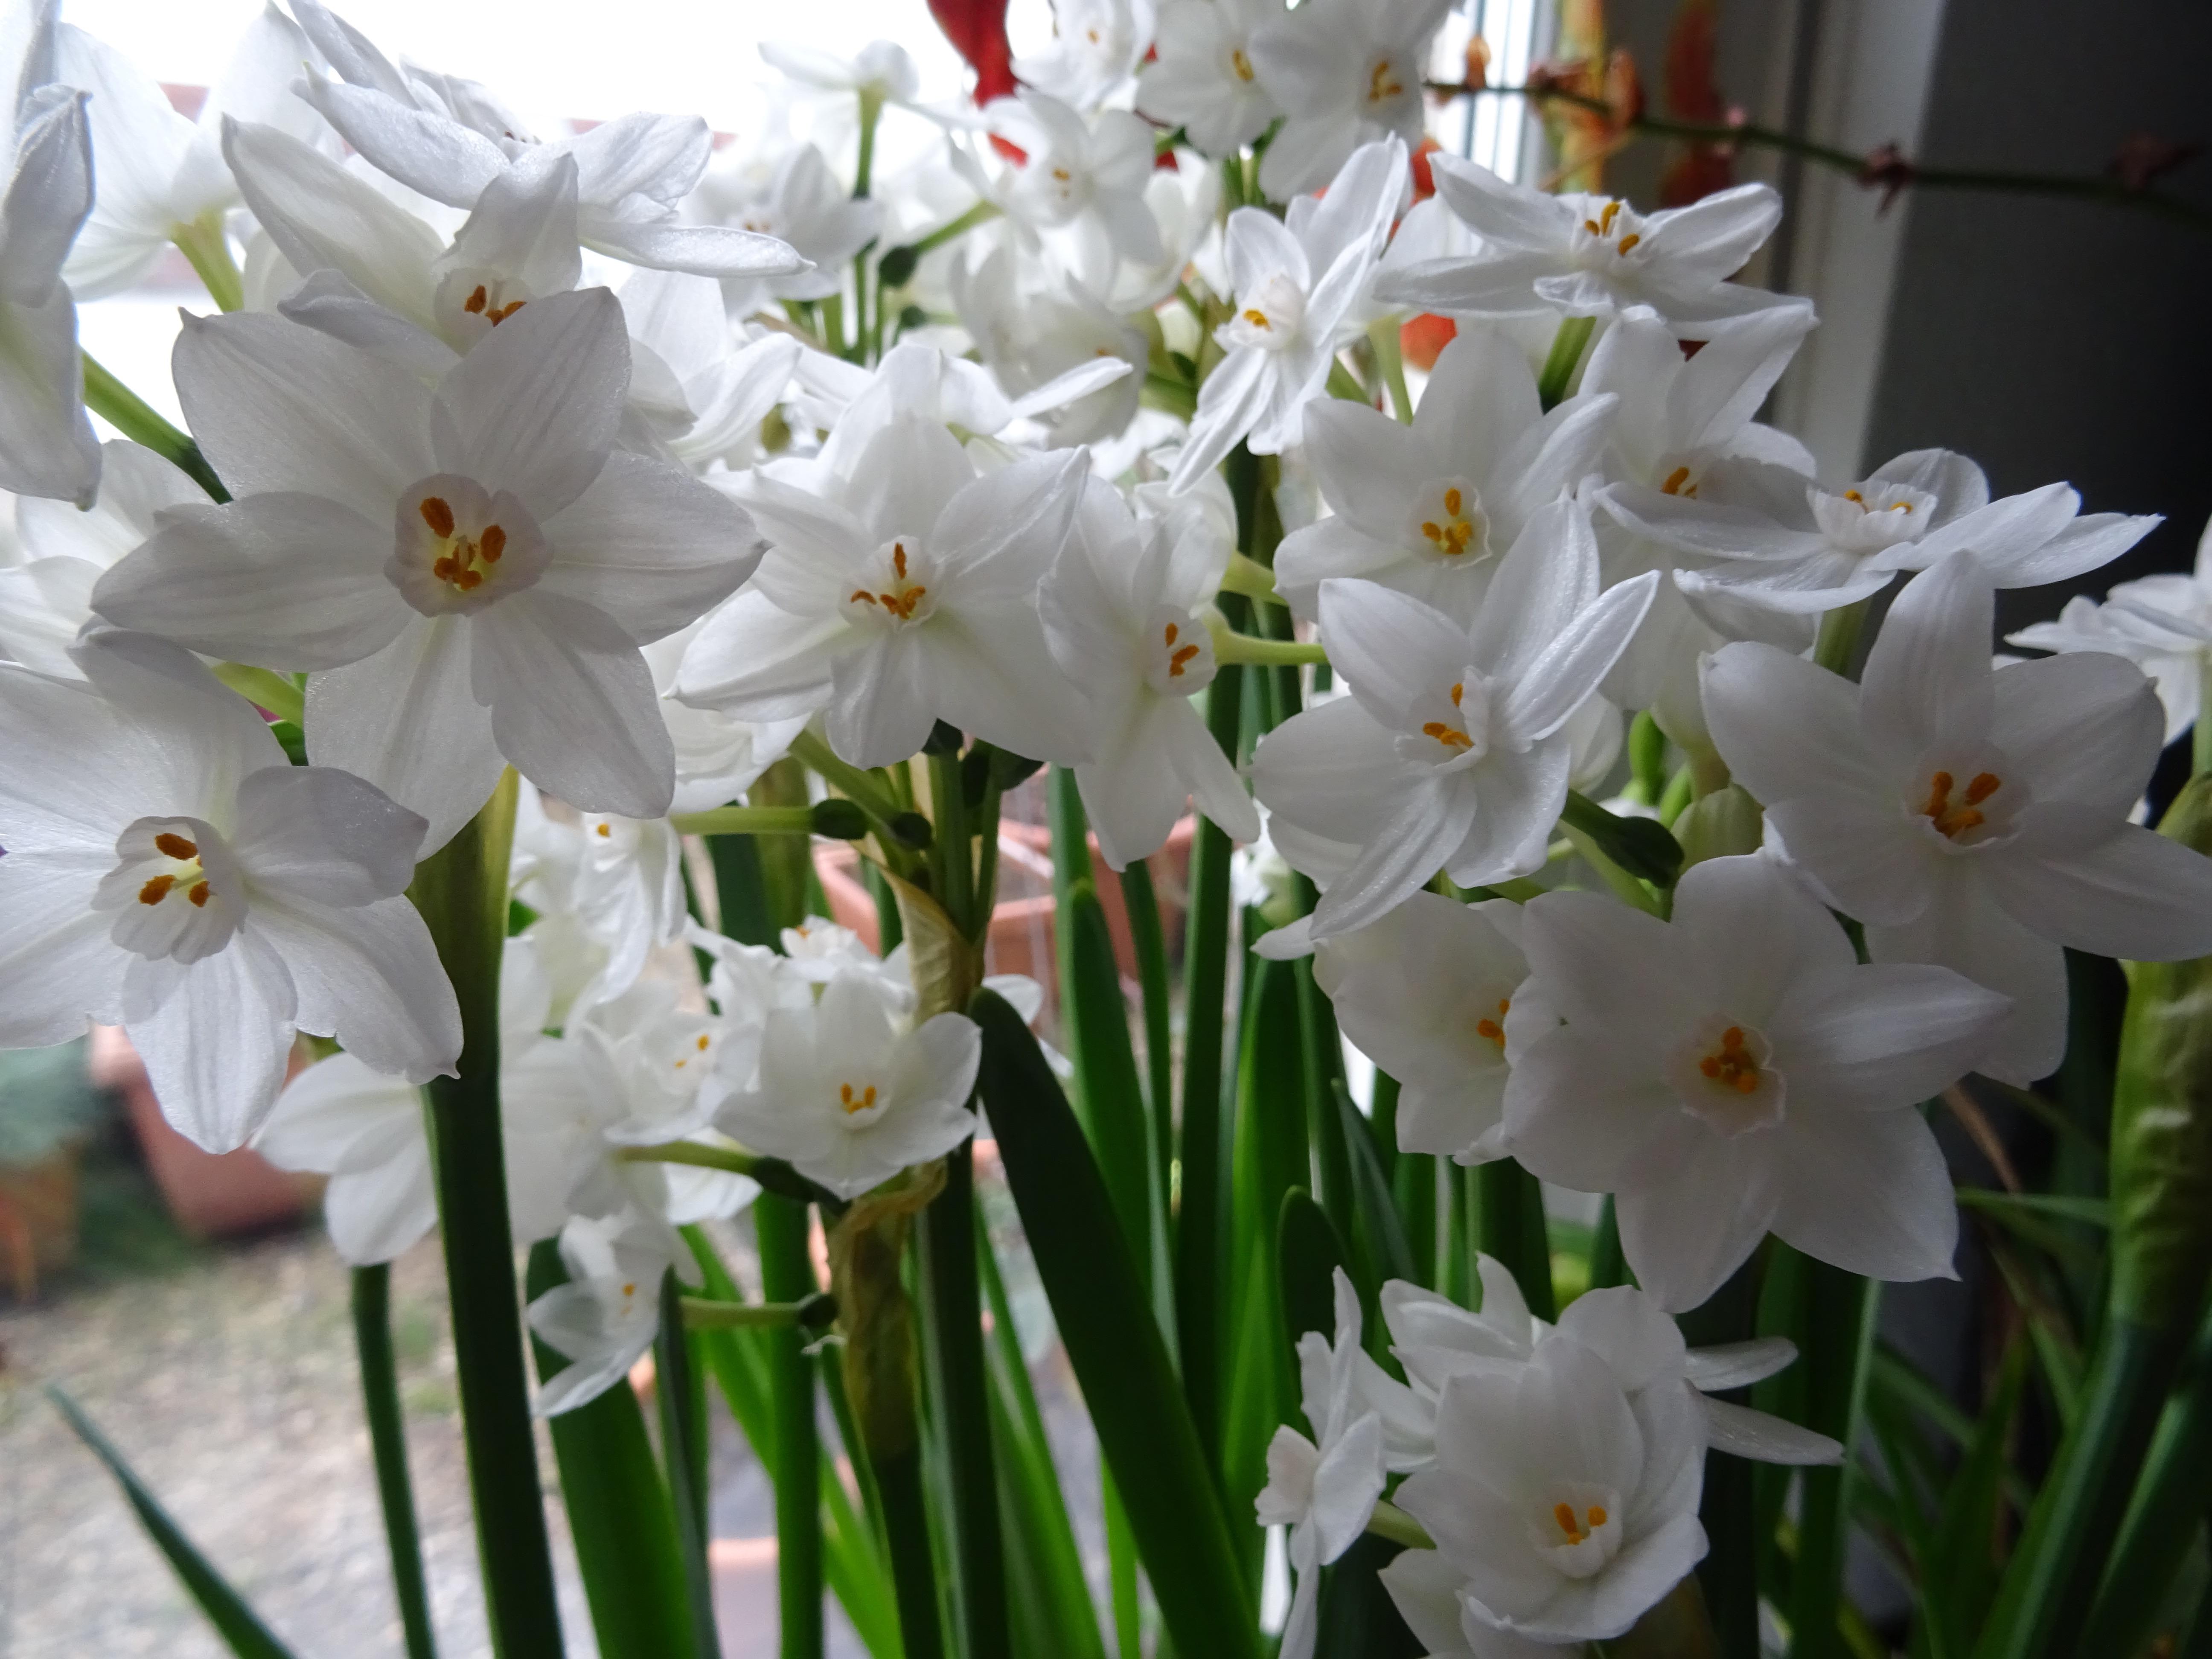 narcissus tazetta 'Ziwa' Blütengruppe